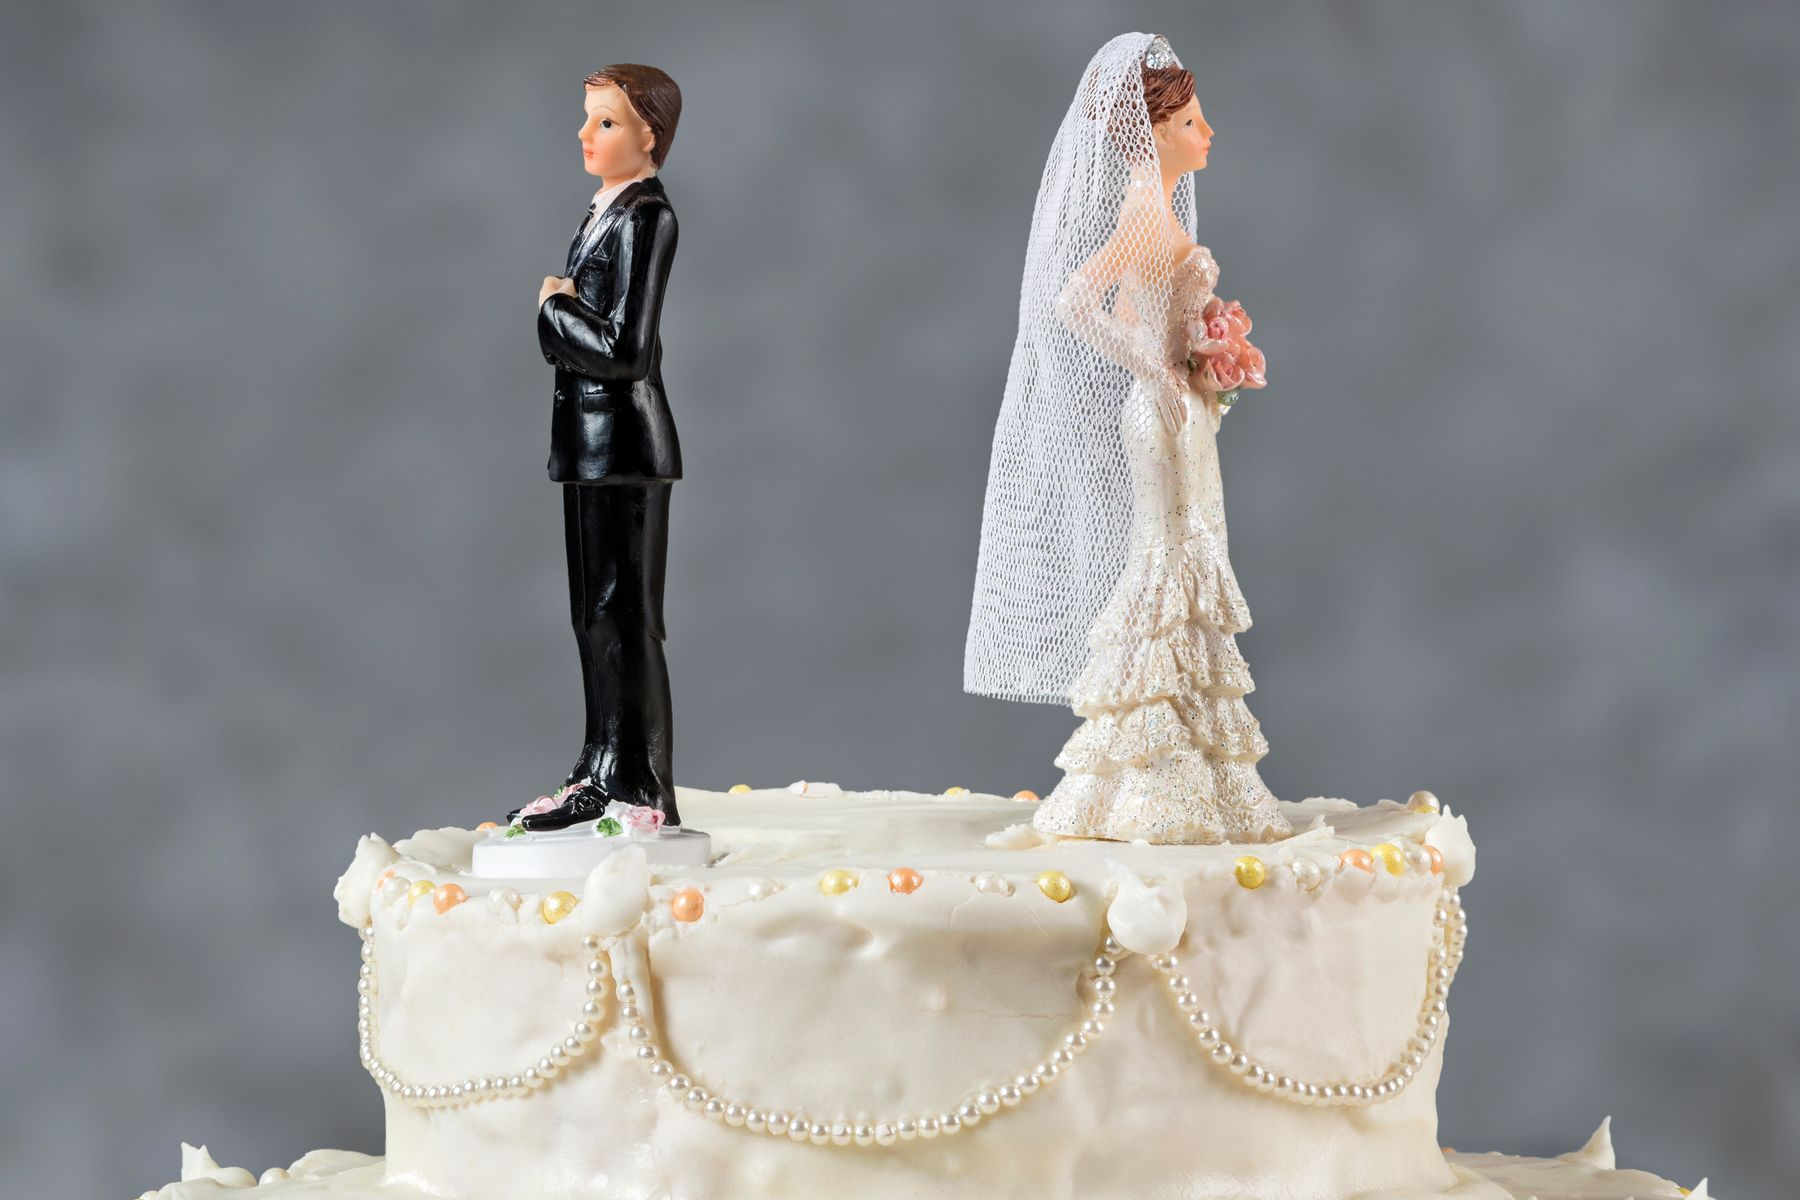 Marital Misconduct in North Carolina